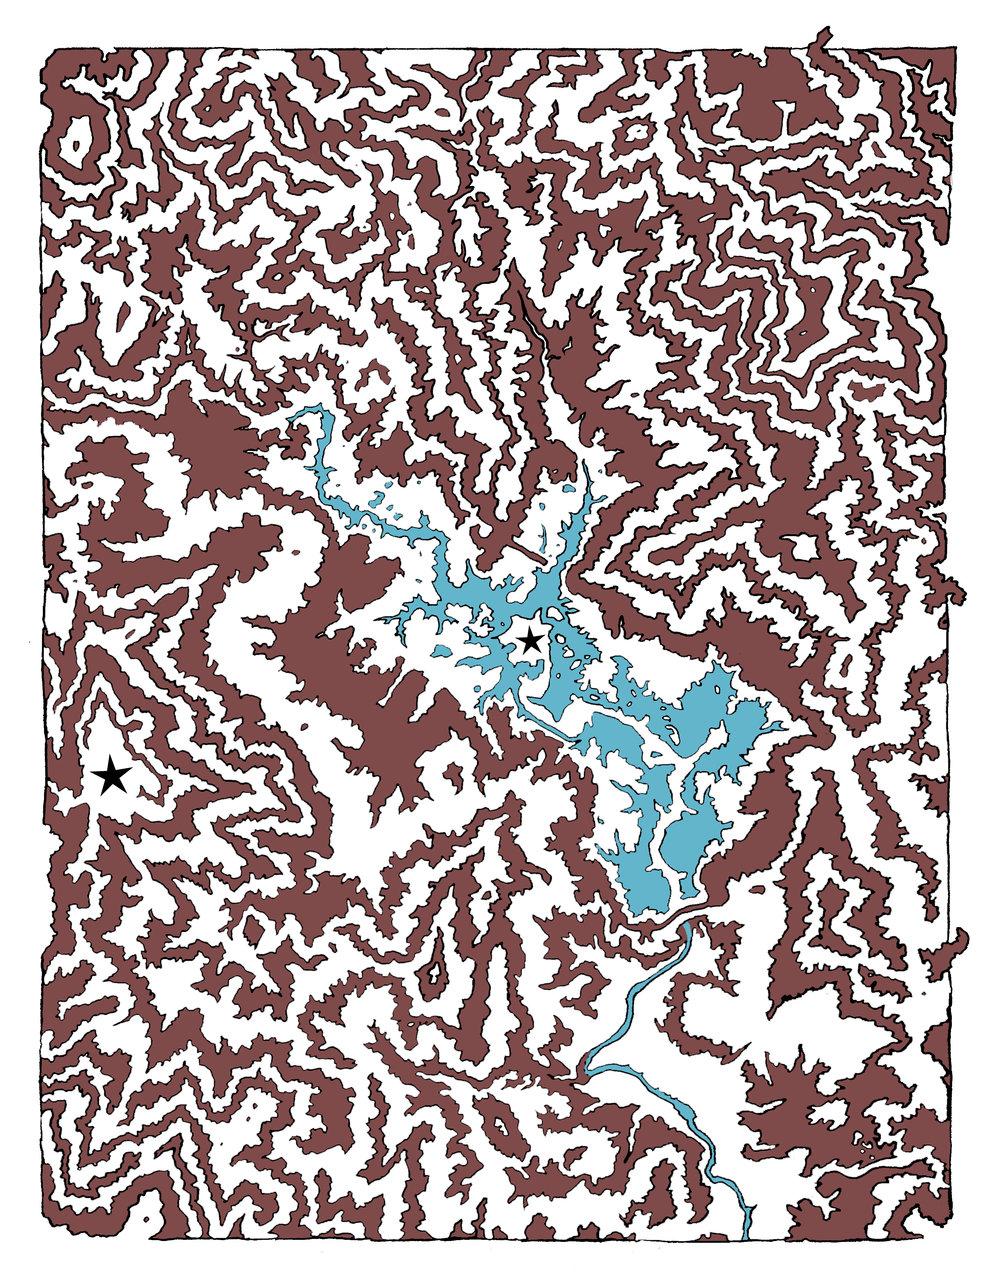 Whiskeytown Maze,  dimensions variable.  Digital image. (2016)